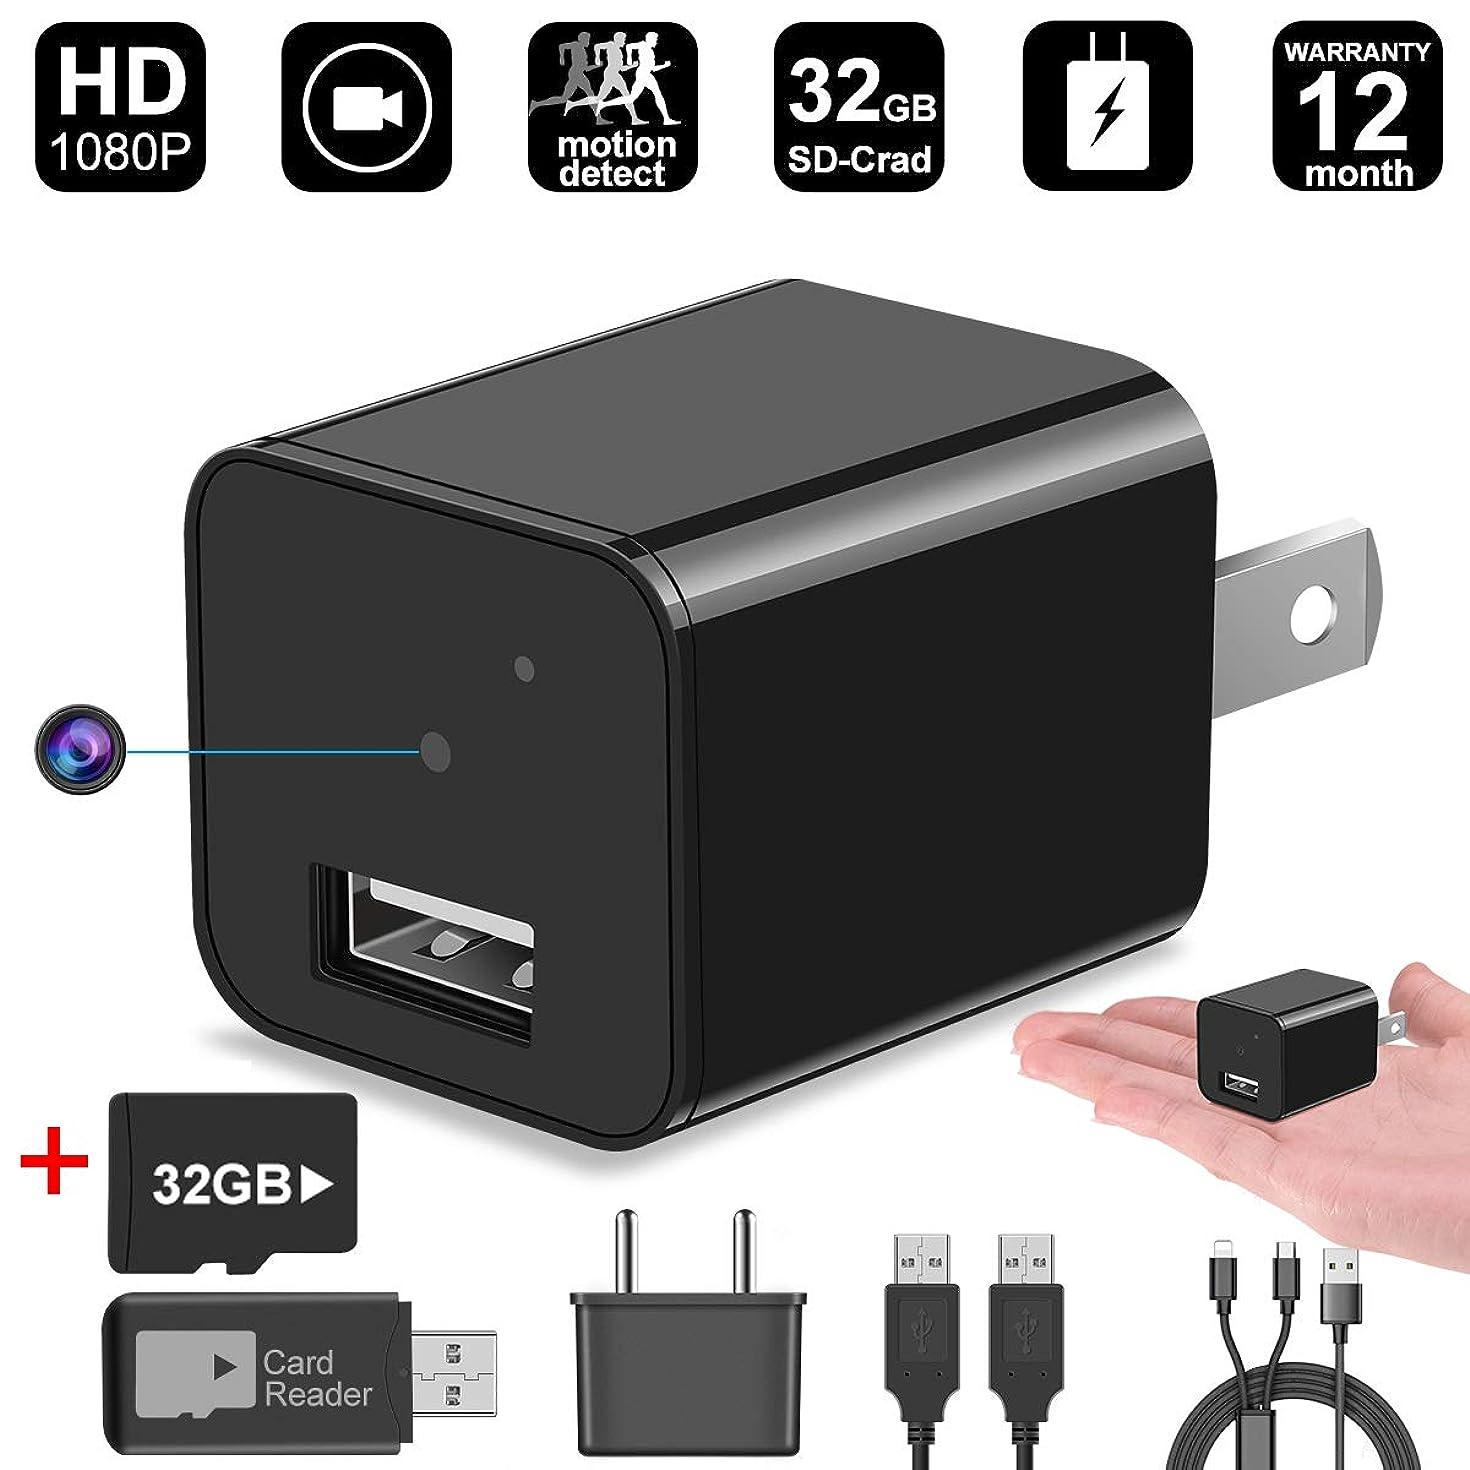 Spy Camera Charger - Hidden Camera 32GB- Motion Detection 1080P - USB Hidden Camera - Surveillance Camera - Mini spy Camera - USB Camera - Camera Charger - Security Camera - Nanny Cam